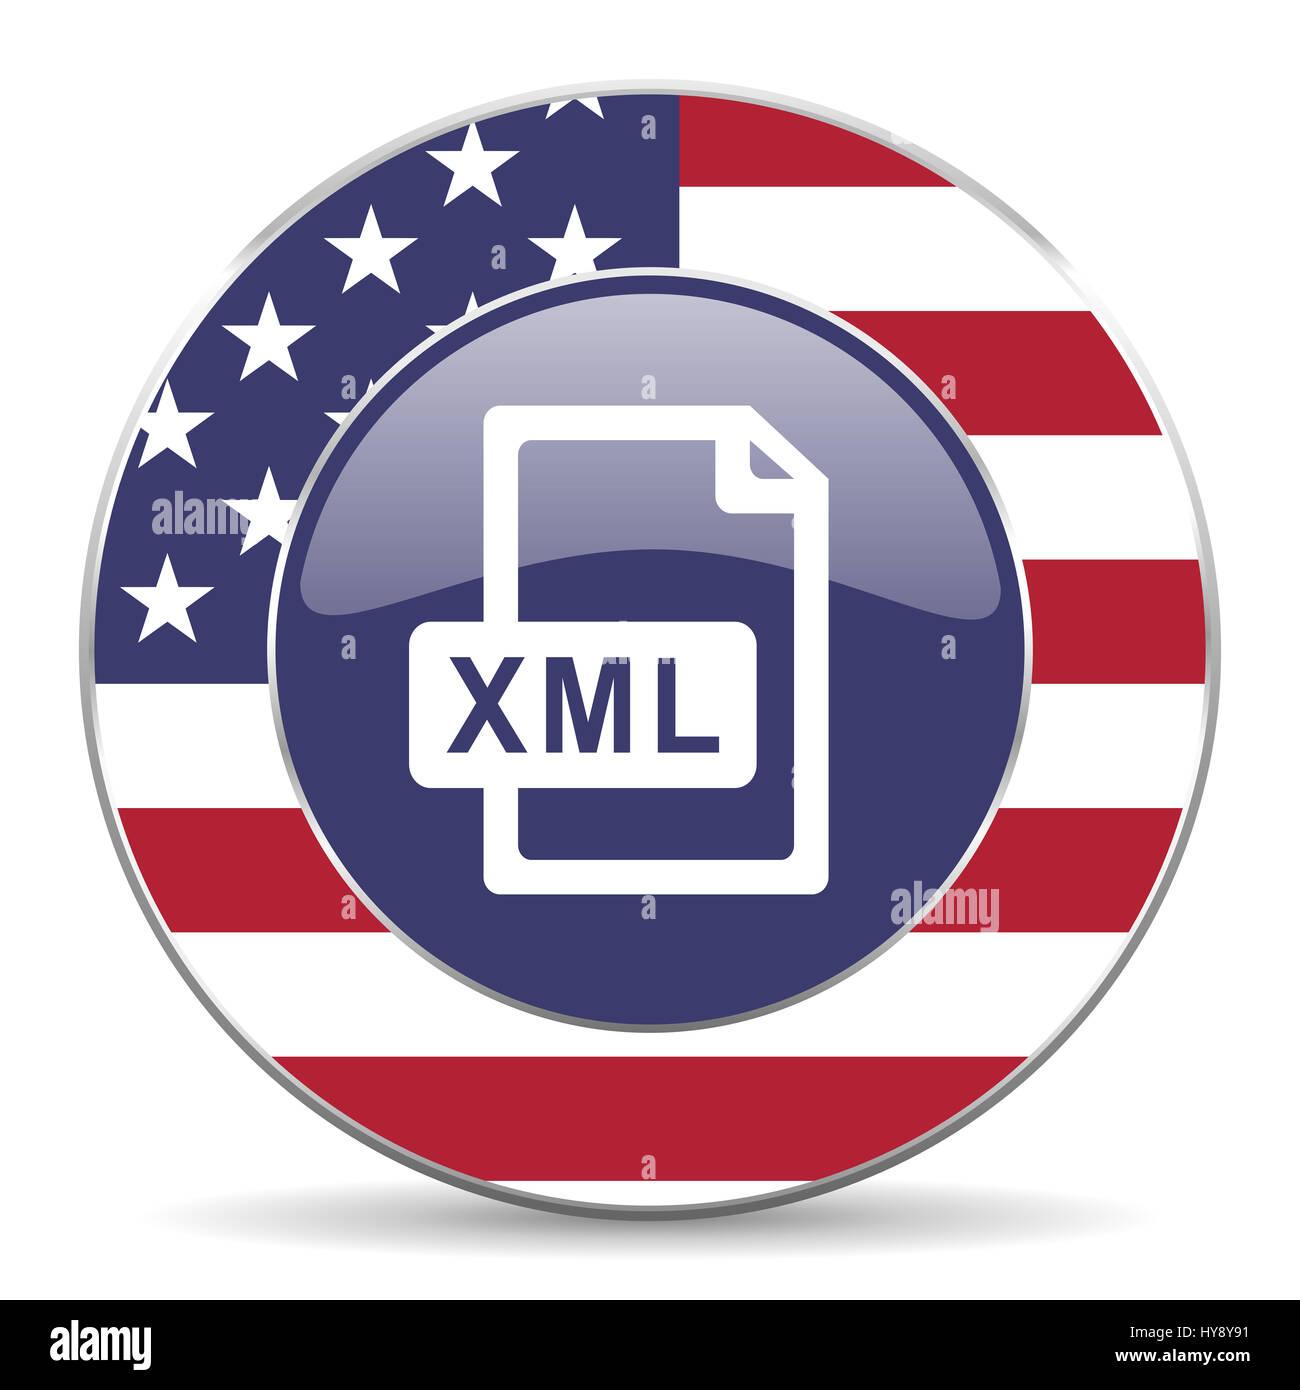 Background image xml - Stock Photo Xml File Usa Design Web American Round Internet Icon With Shadow On White Background